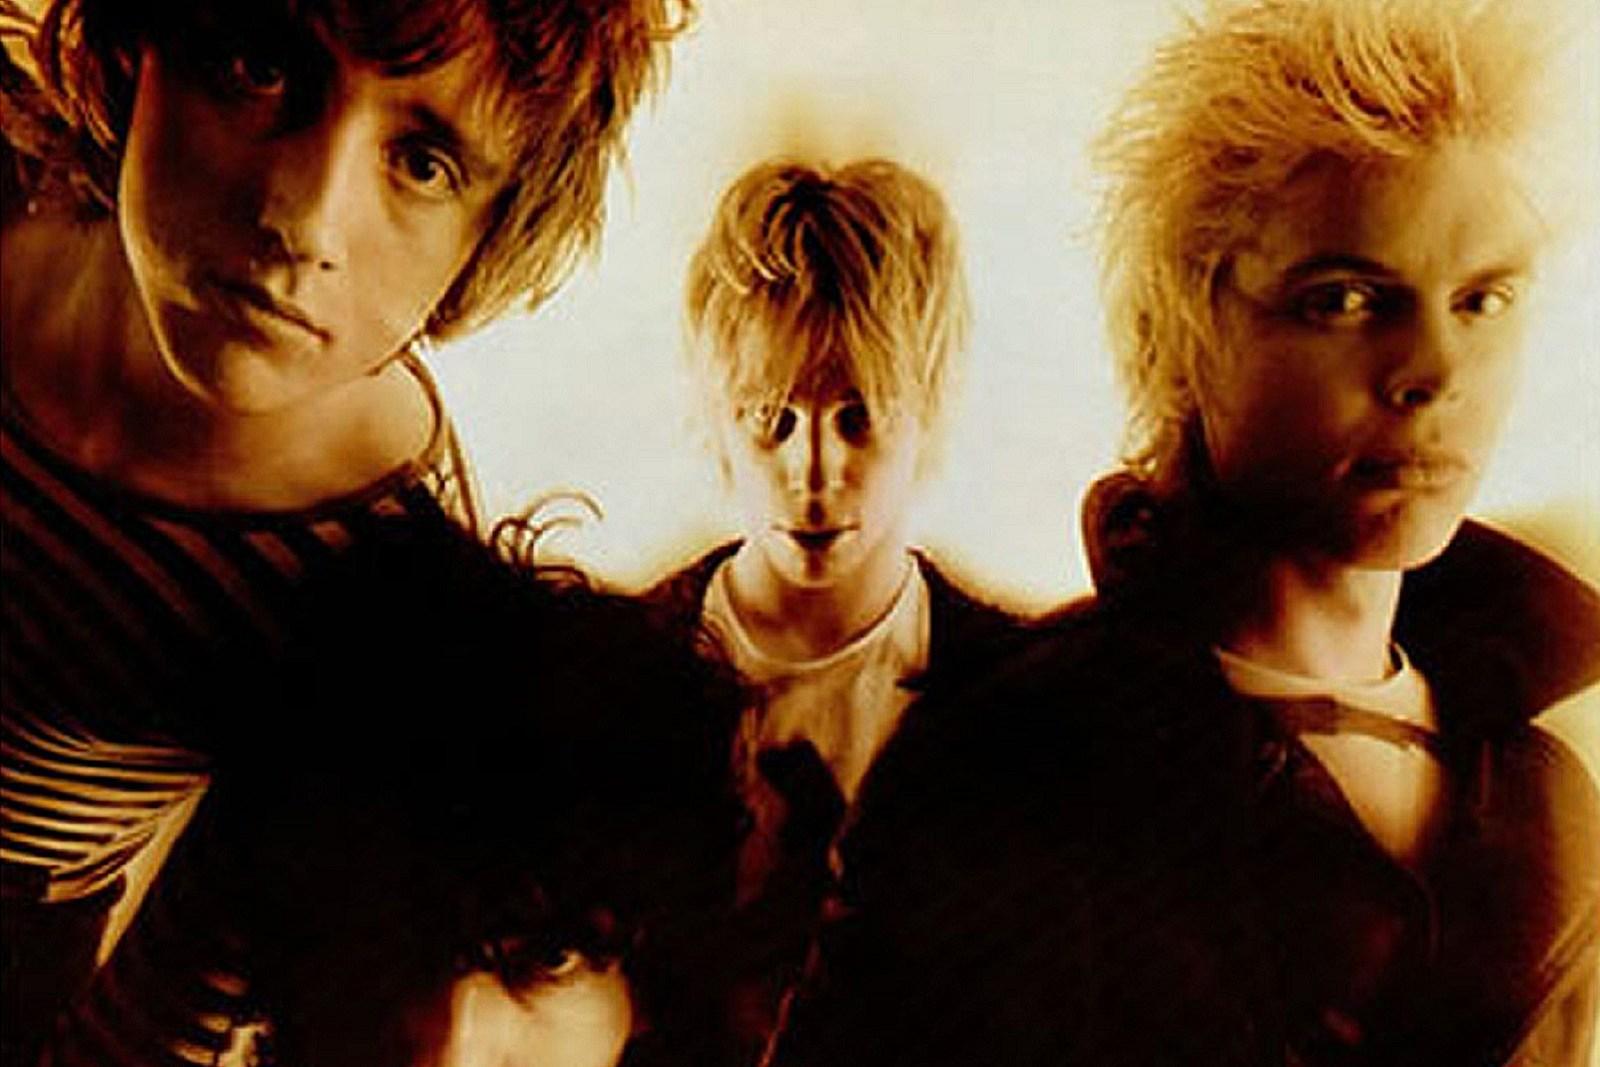 40 Years Ago: Billy Idol's Generation X Release Their Debut Album